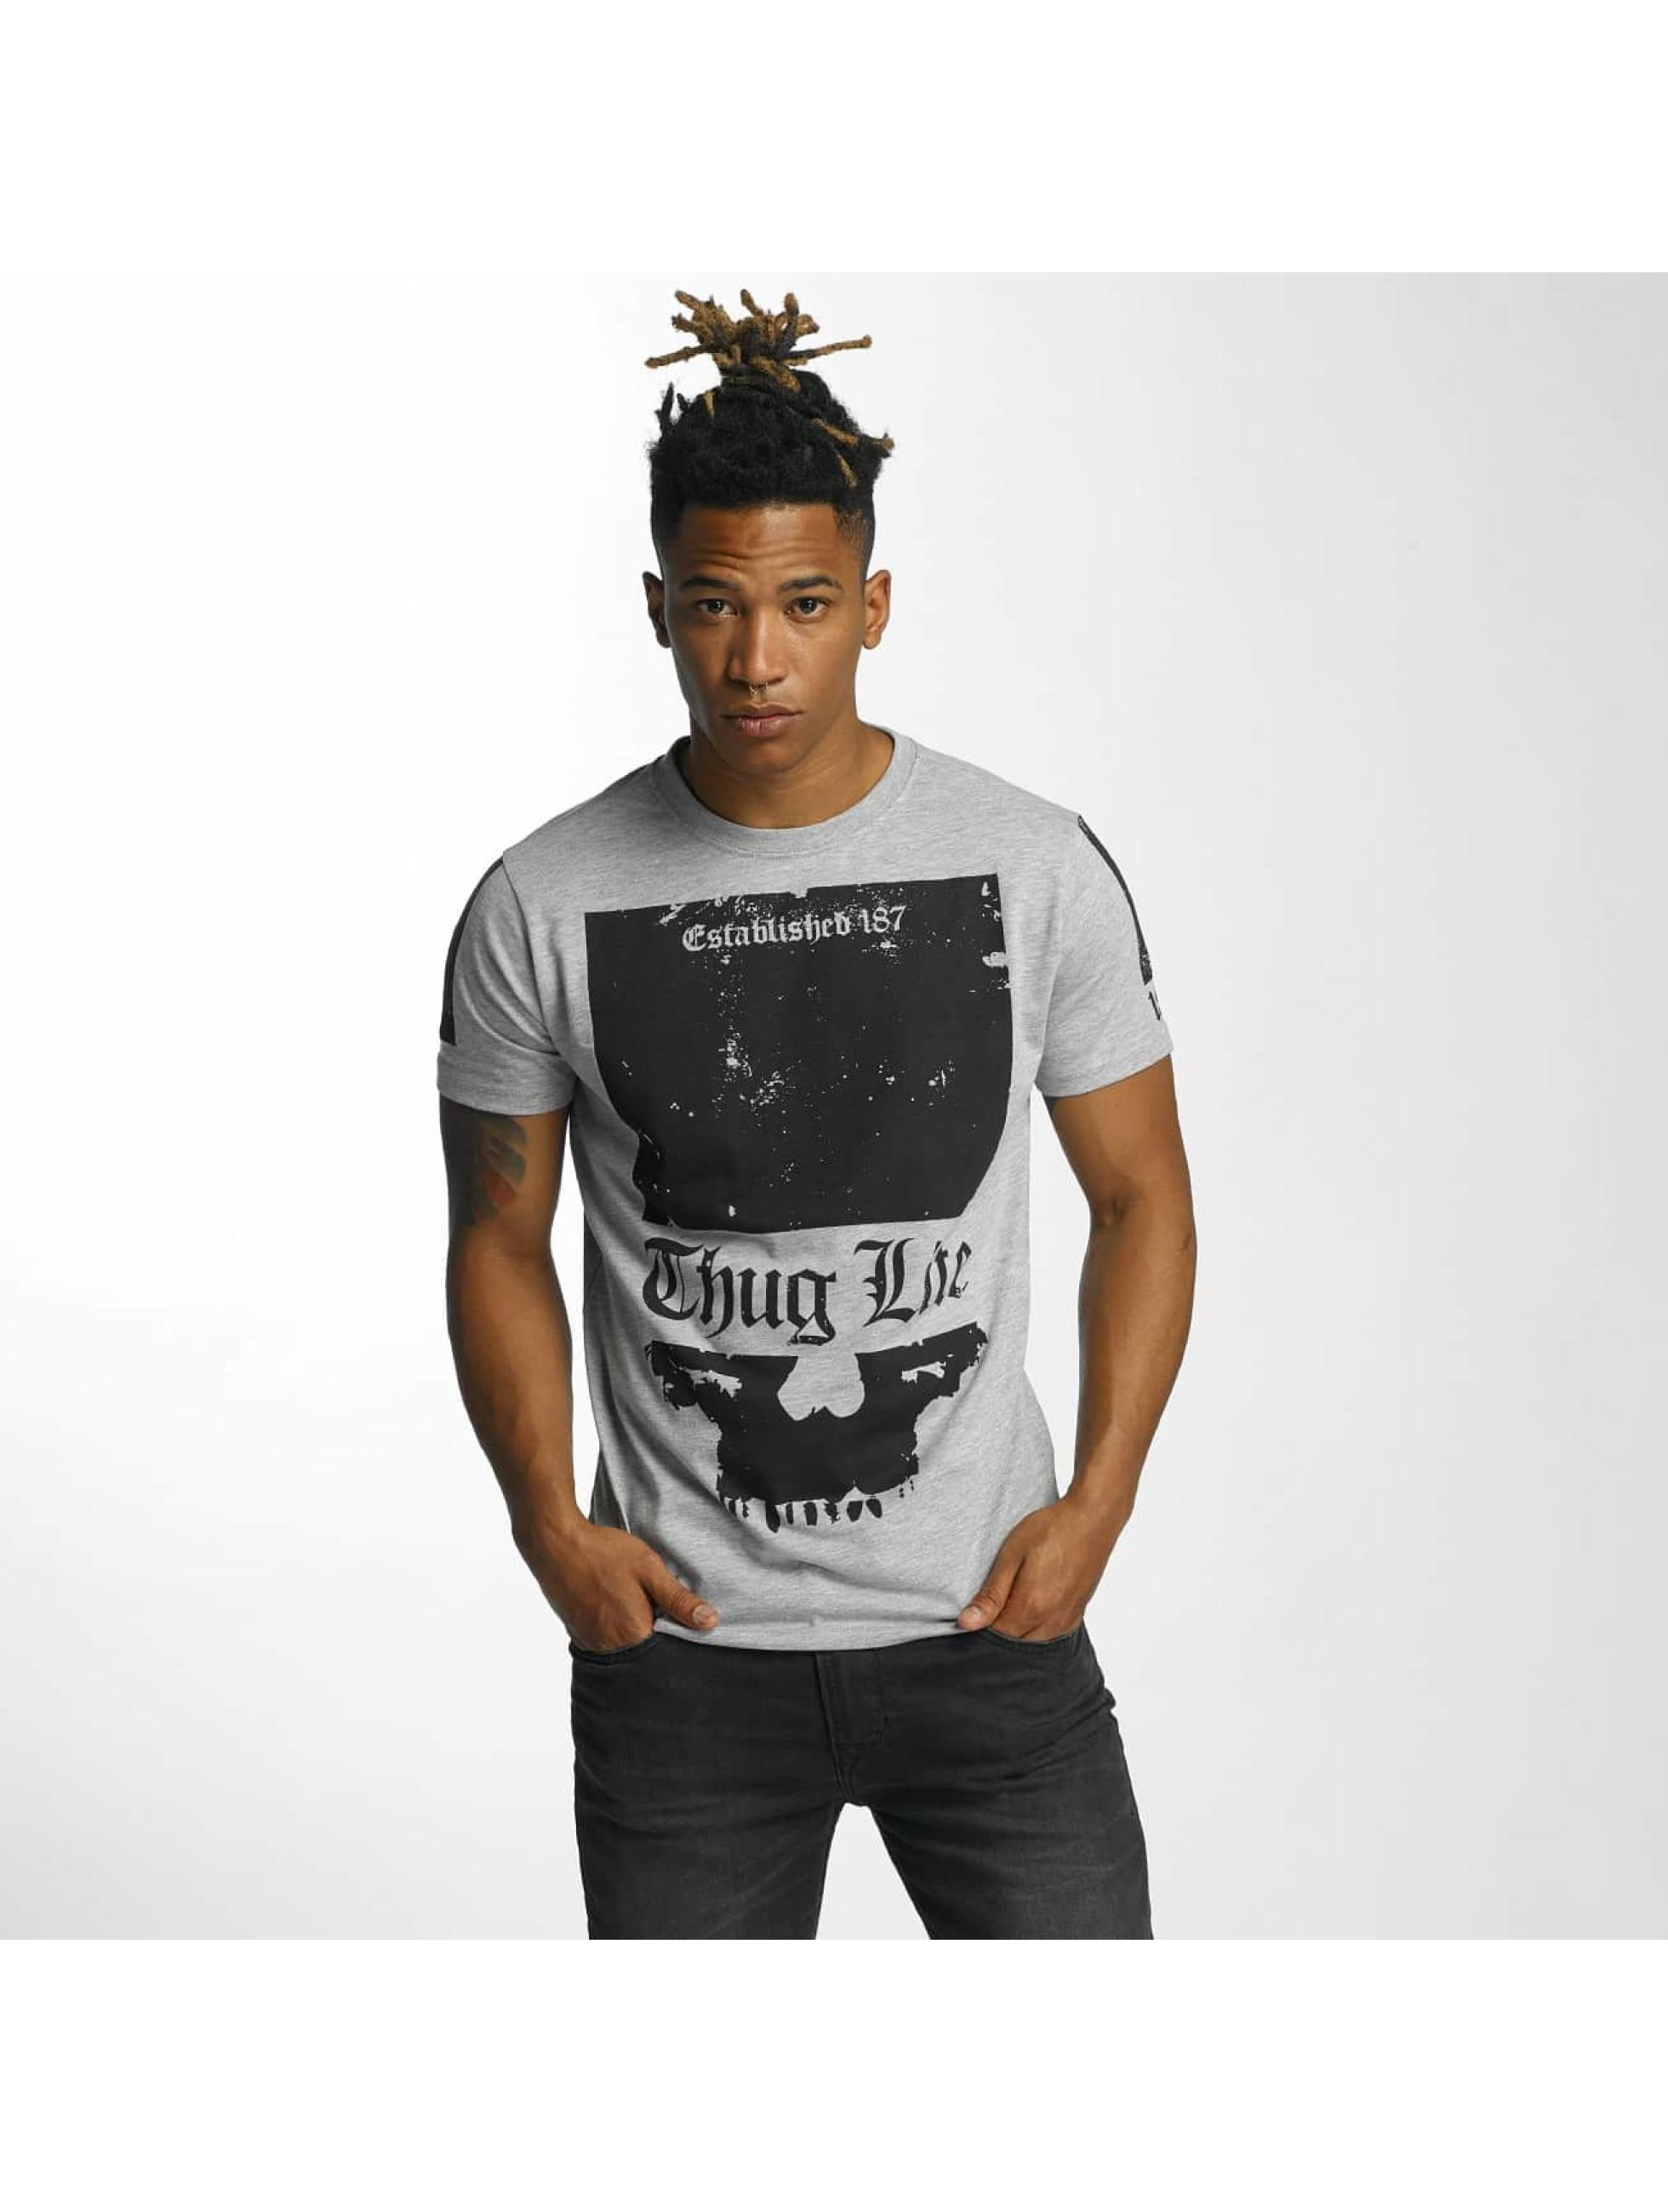 Thug Life / T-Shirt Blind in grey XL